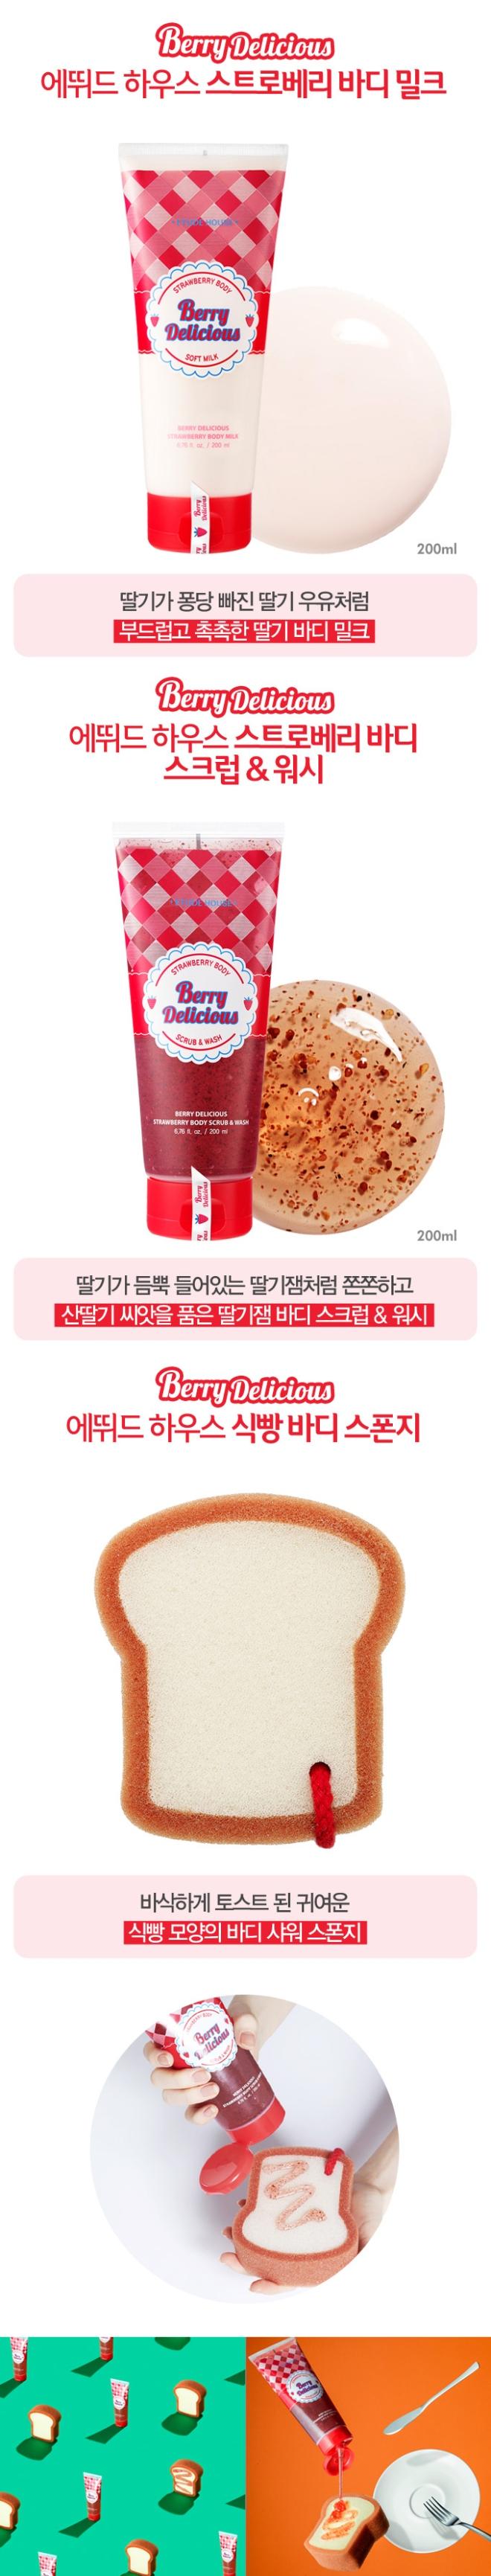 Berry Delicious Strawberry Body Soft Milk & Scrub Wash